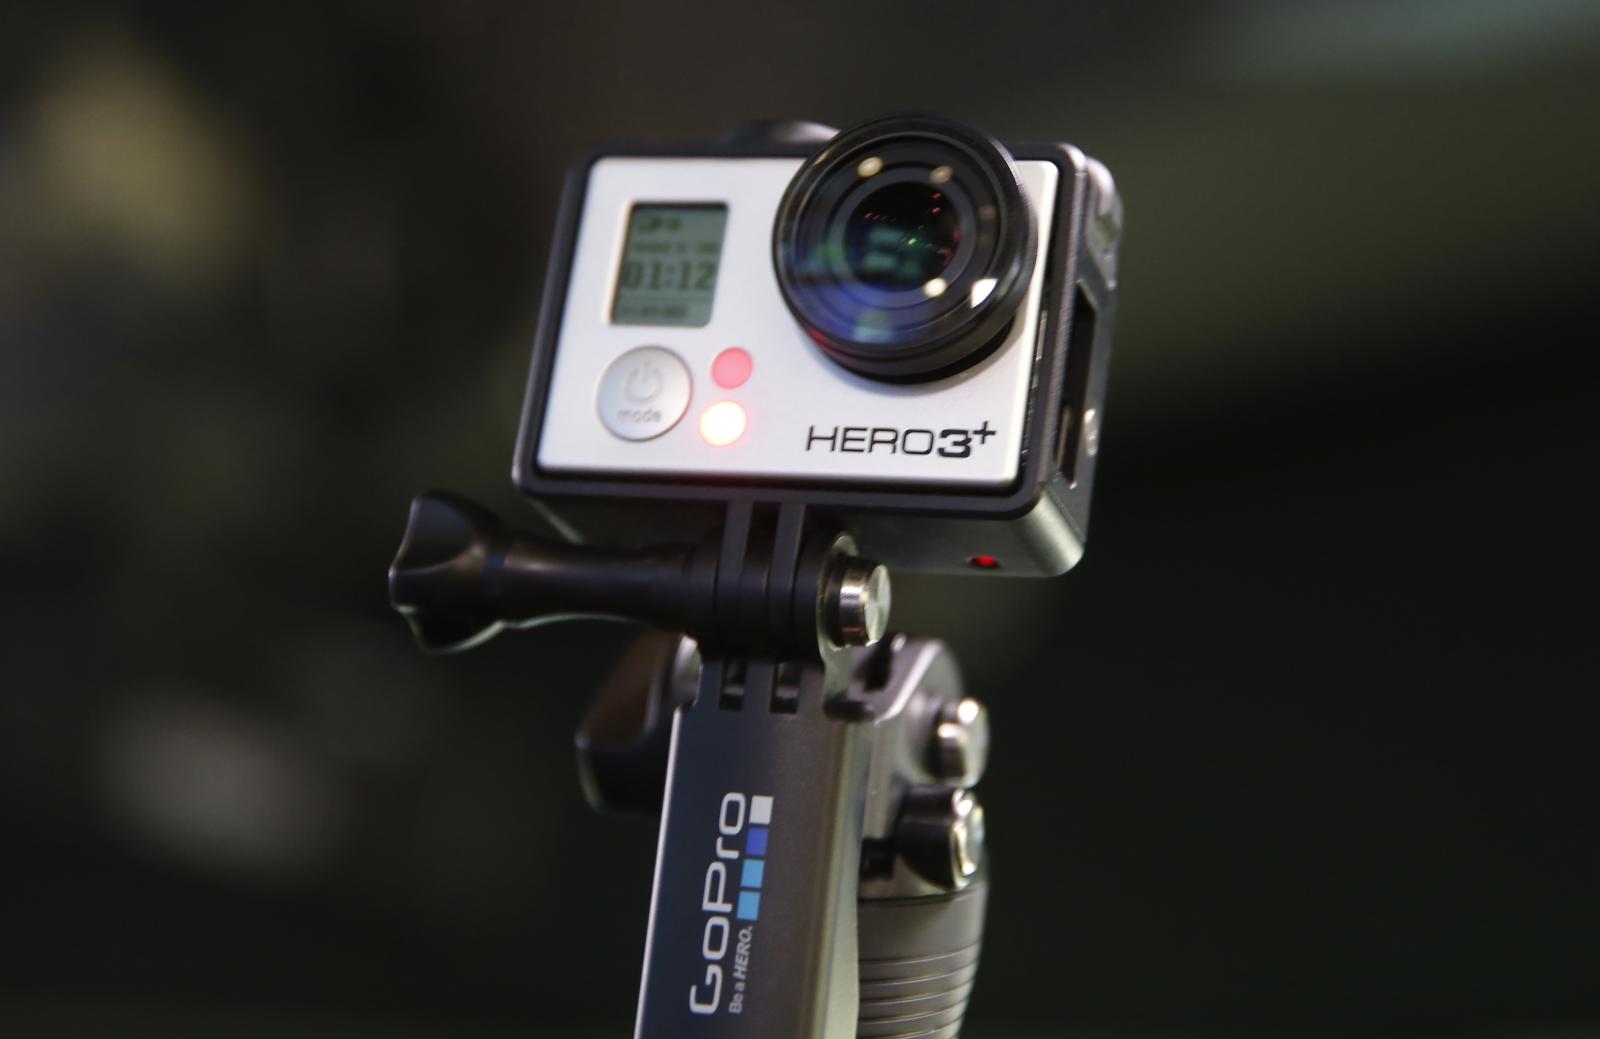 Go-Pro camera